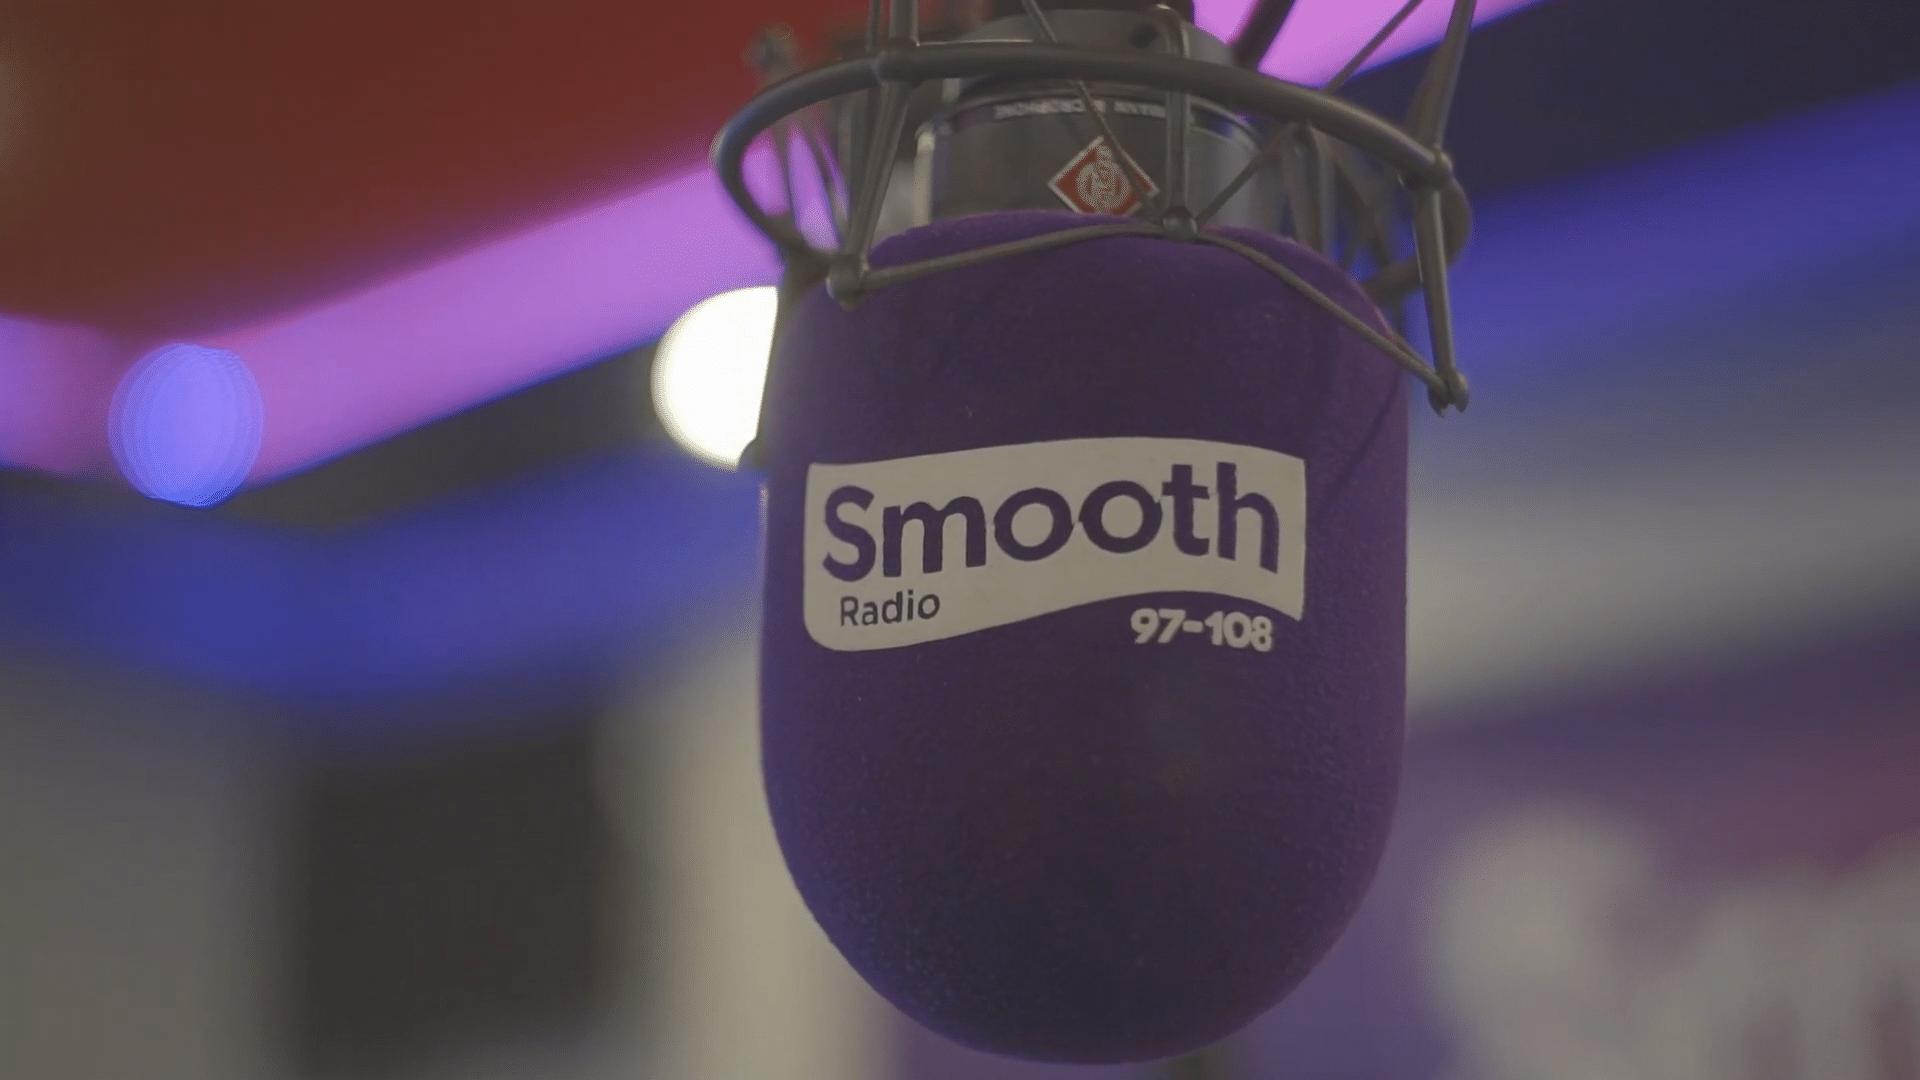 Smooth Radio Microphone in studio